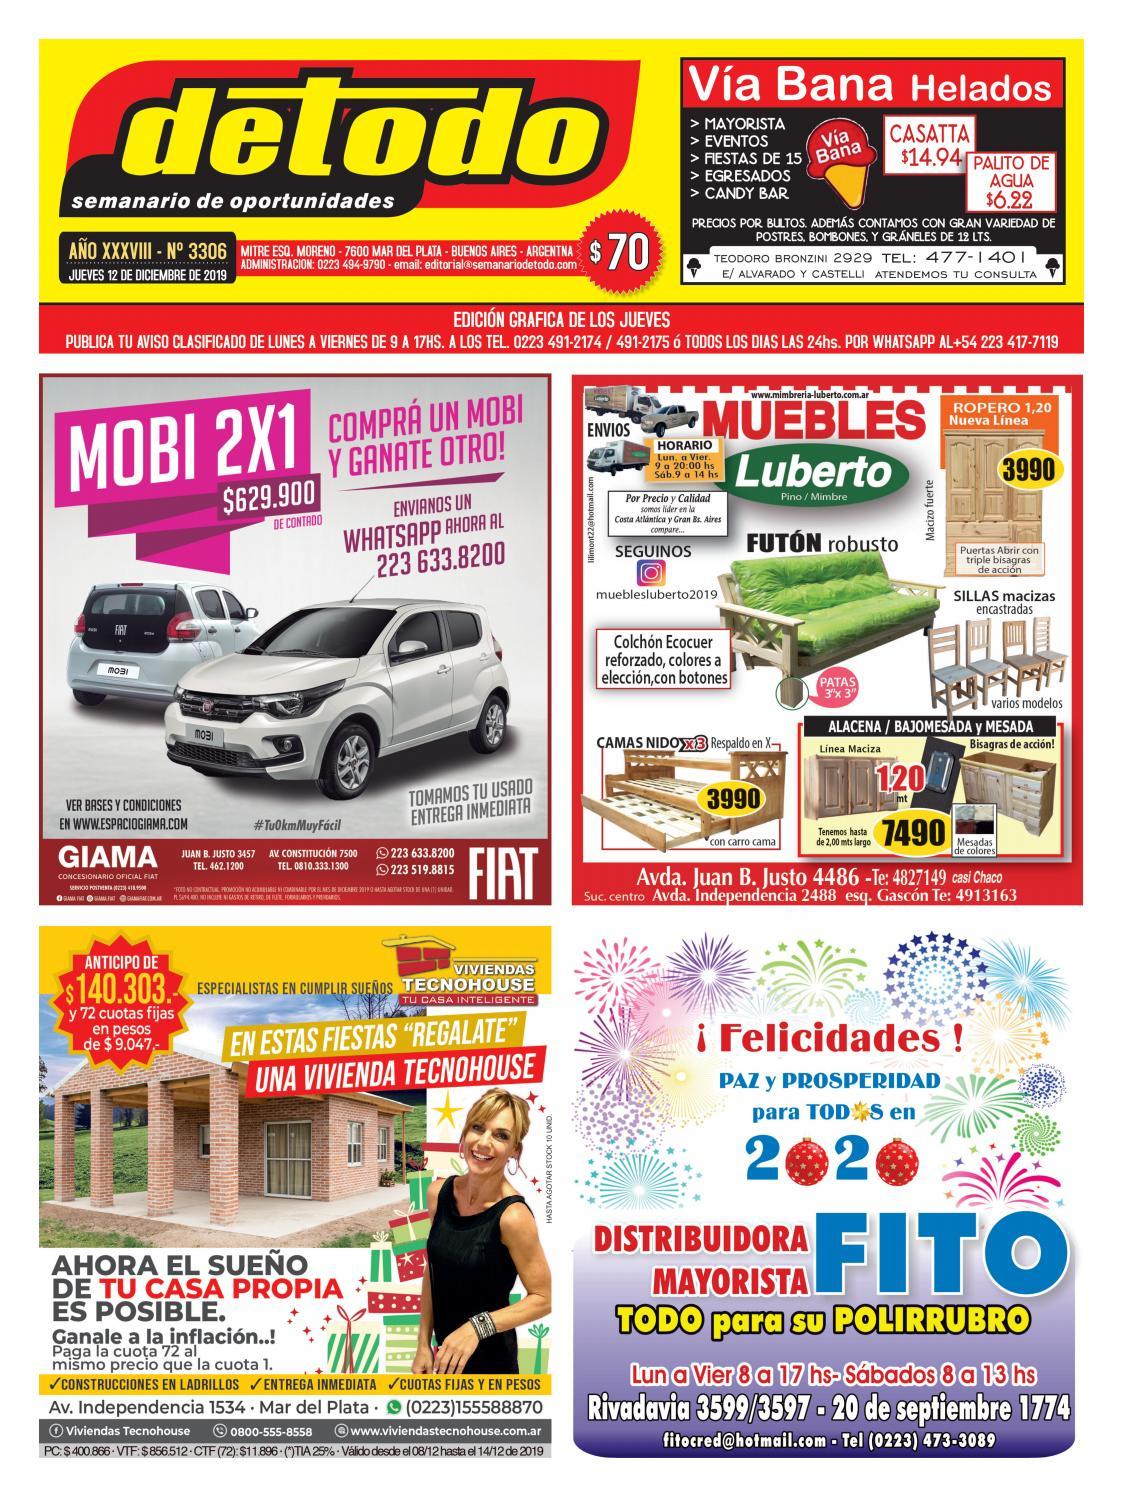 Toyota MR2 MK2 Tarjeta Puerta Interior Lado Pasajero Luz-el señor MR2 Piezas Usadas